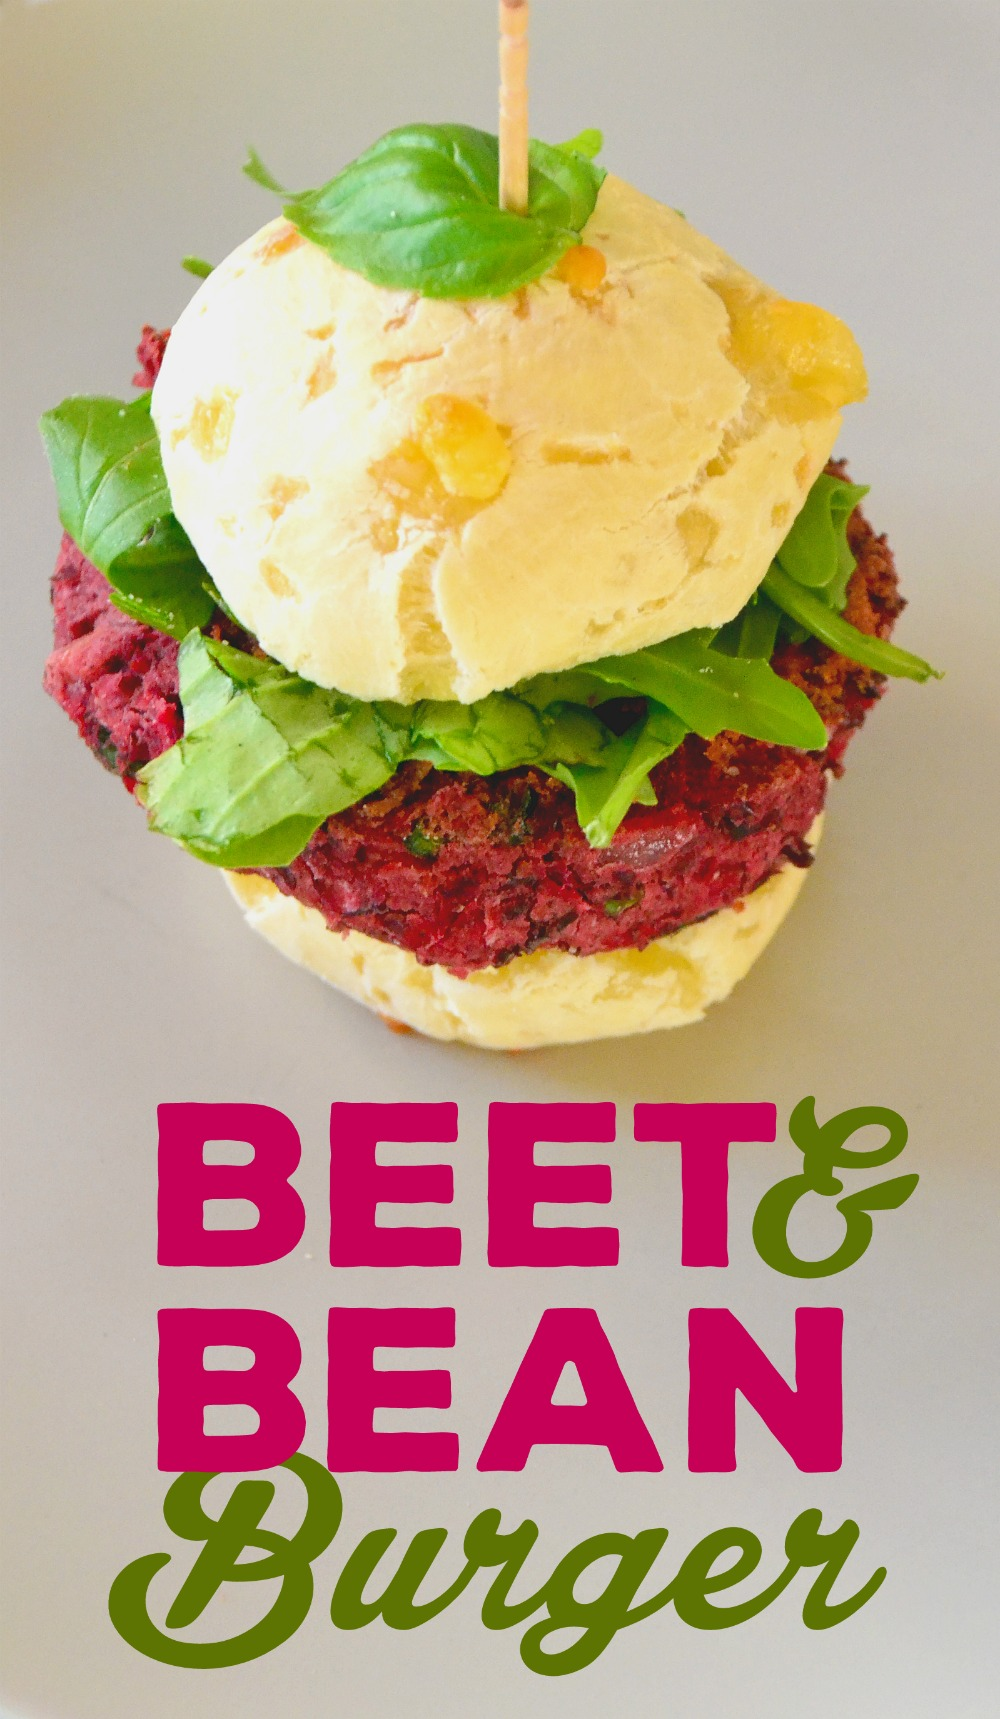 Beet & Bean Burger